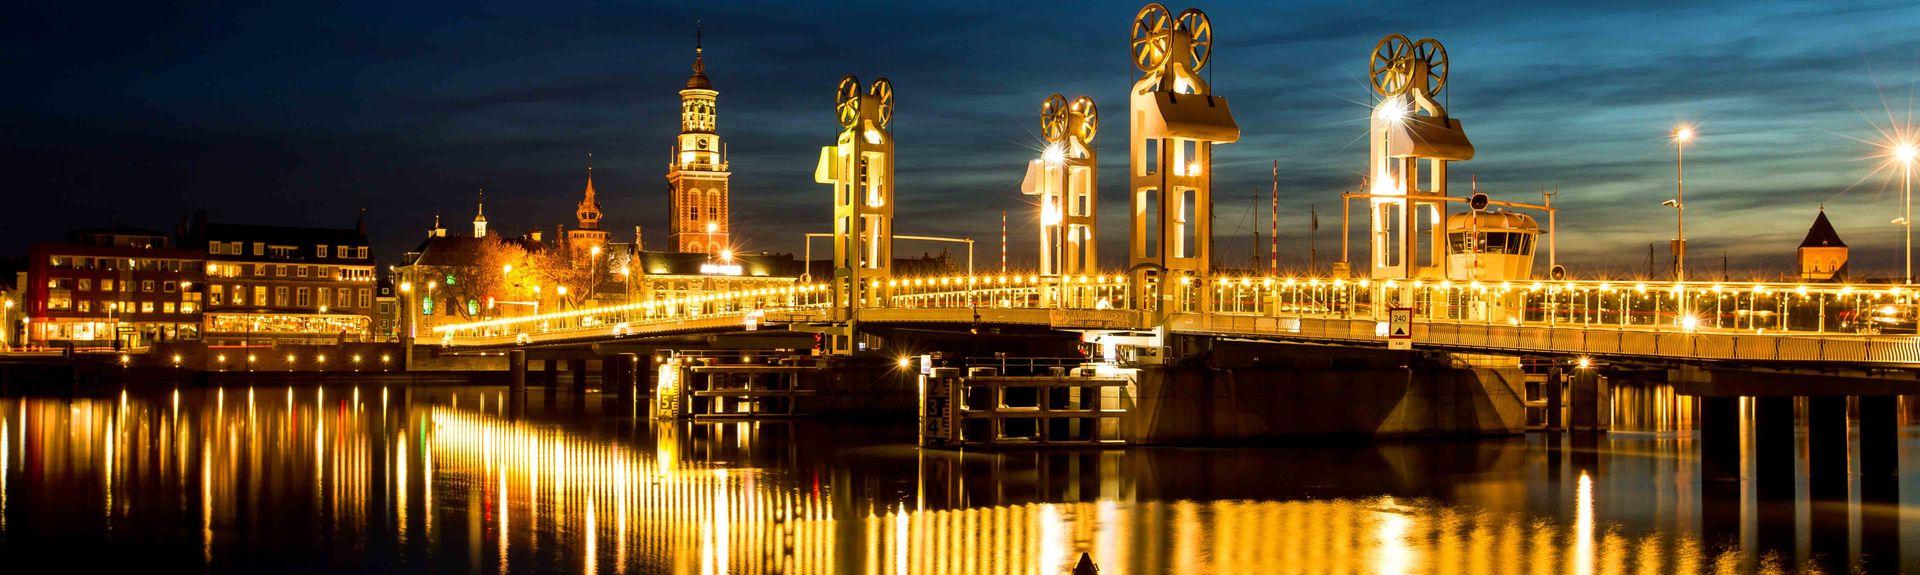 Zwolle, Overijssel, Pays-Bas